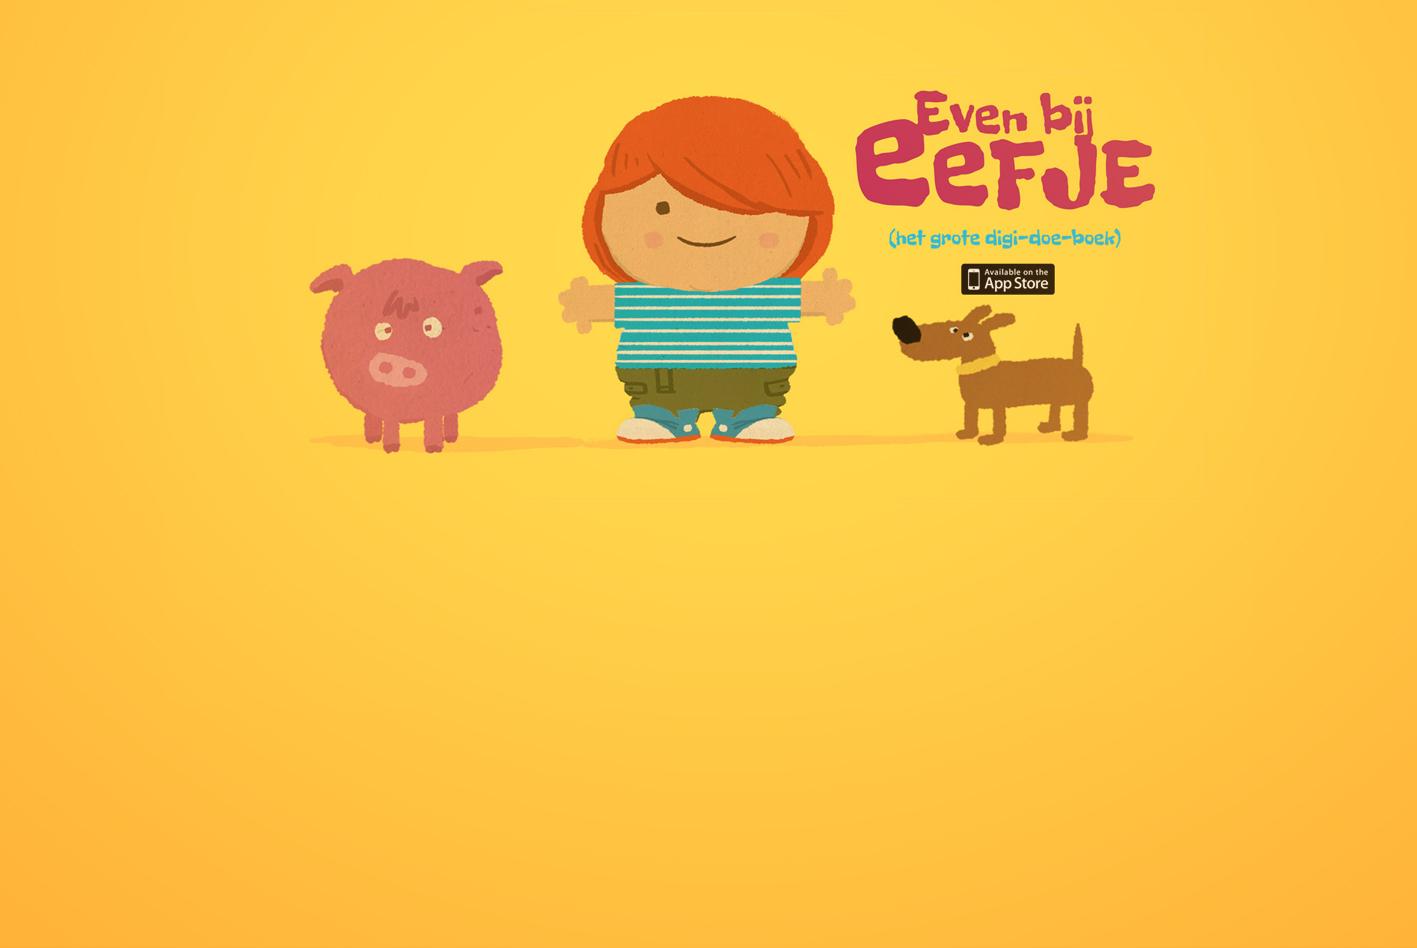 http://www.studiomik.nl/uploads/images/Evenbijeefje-cover.jpg